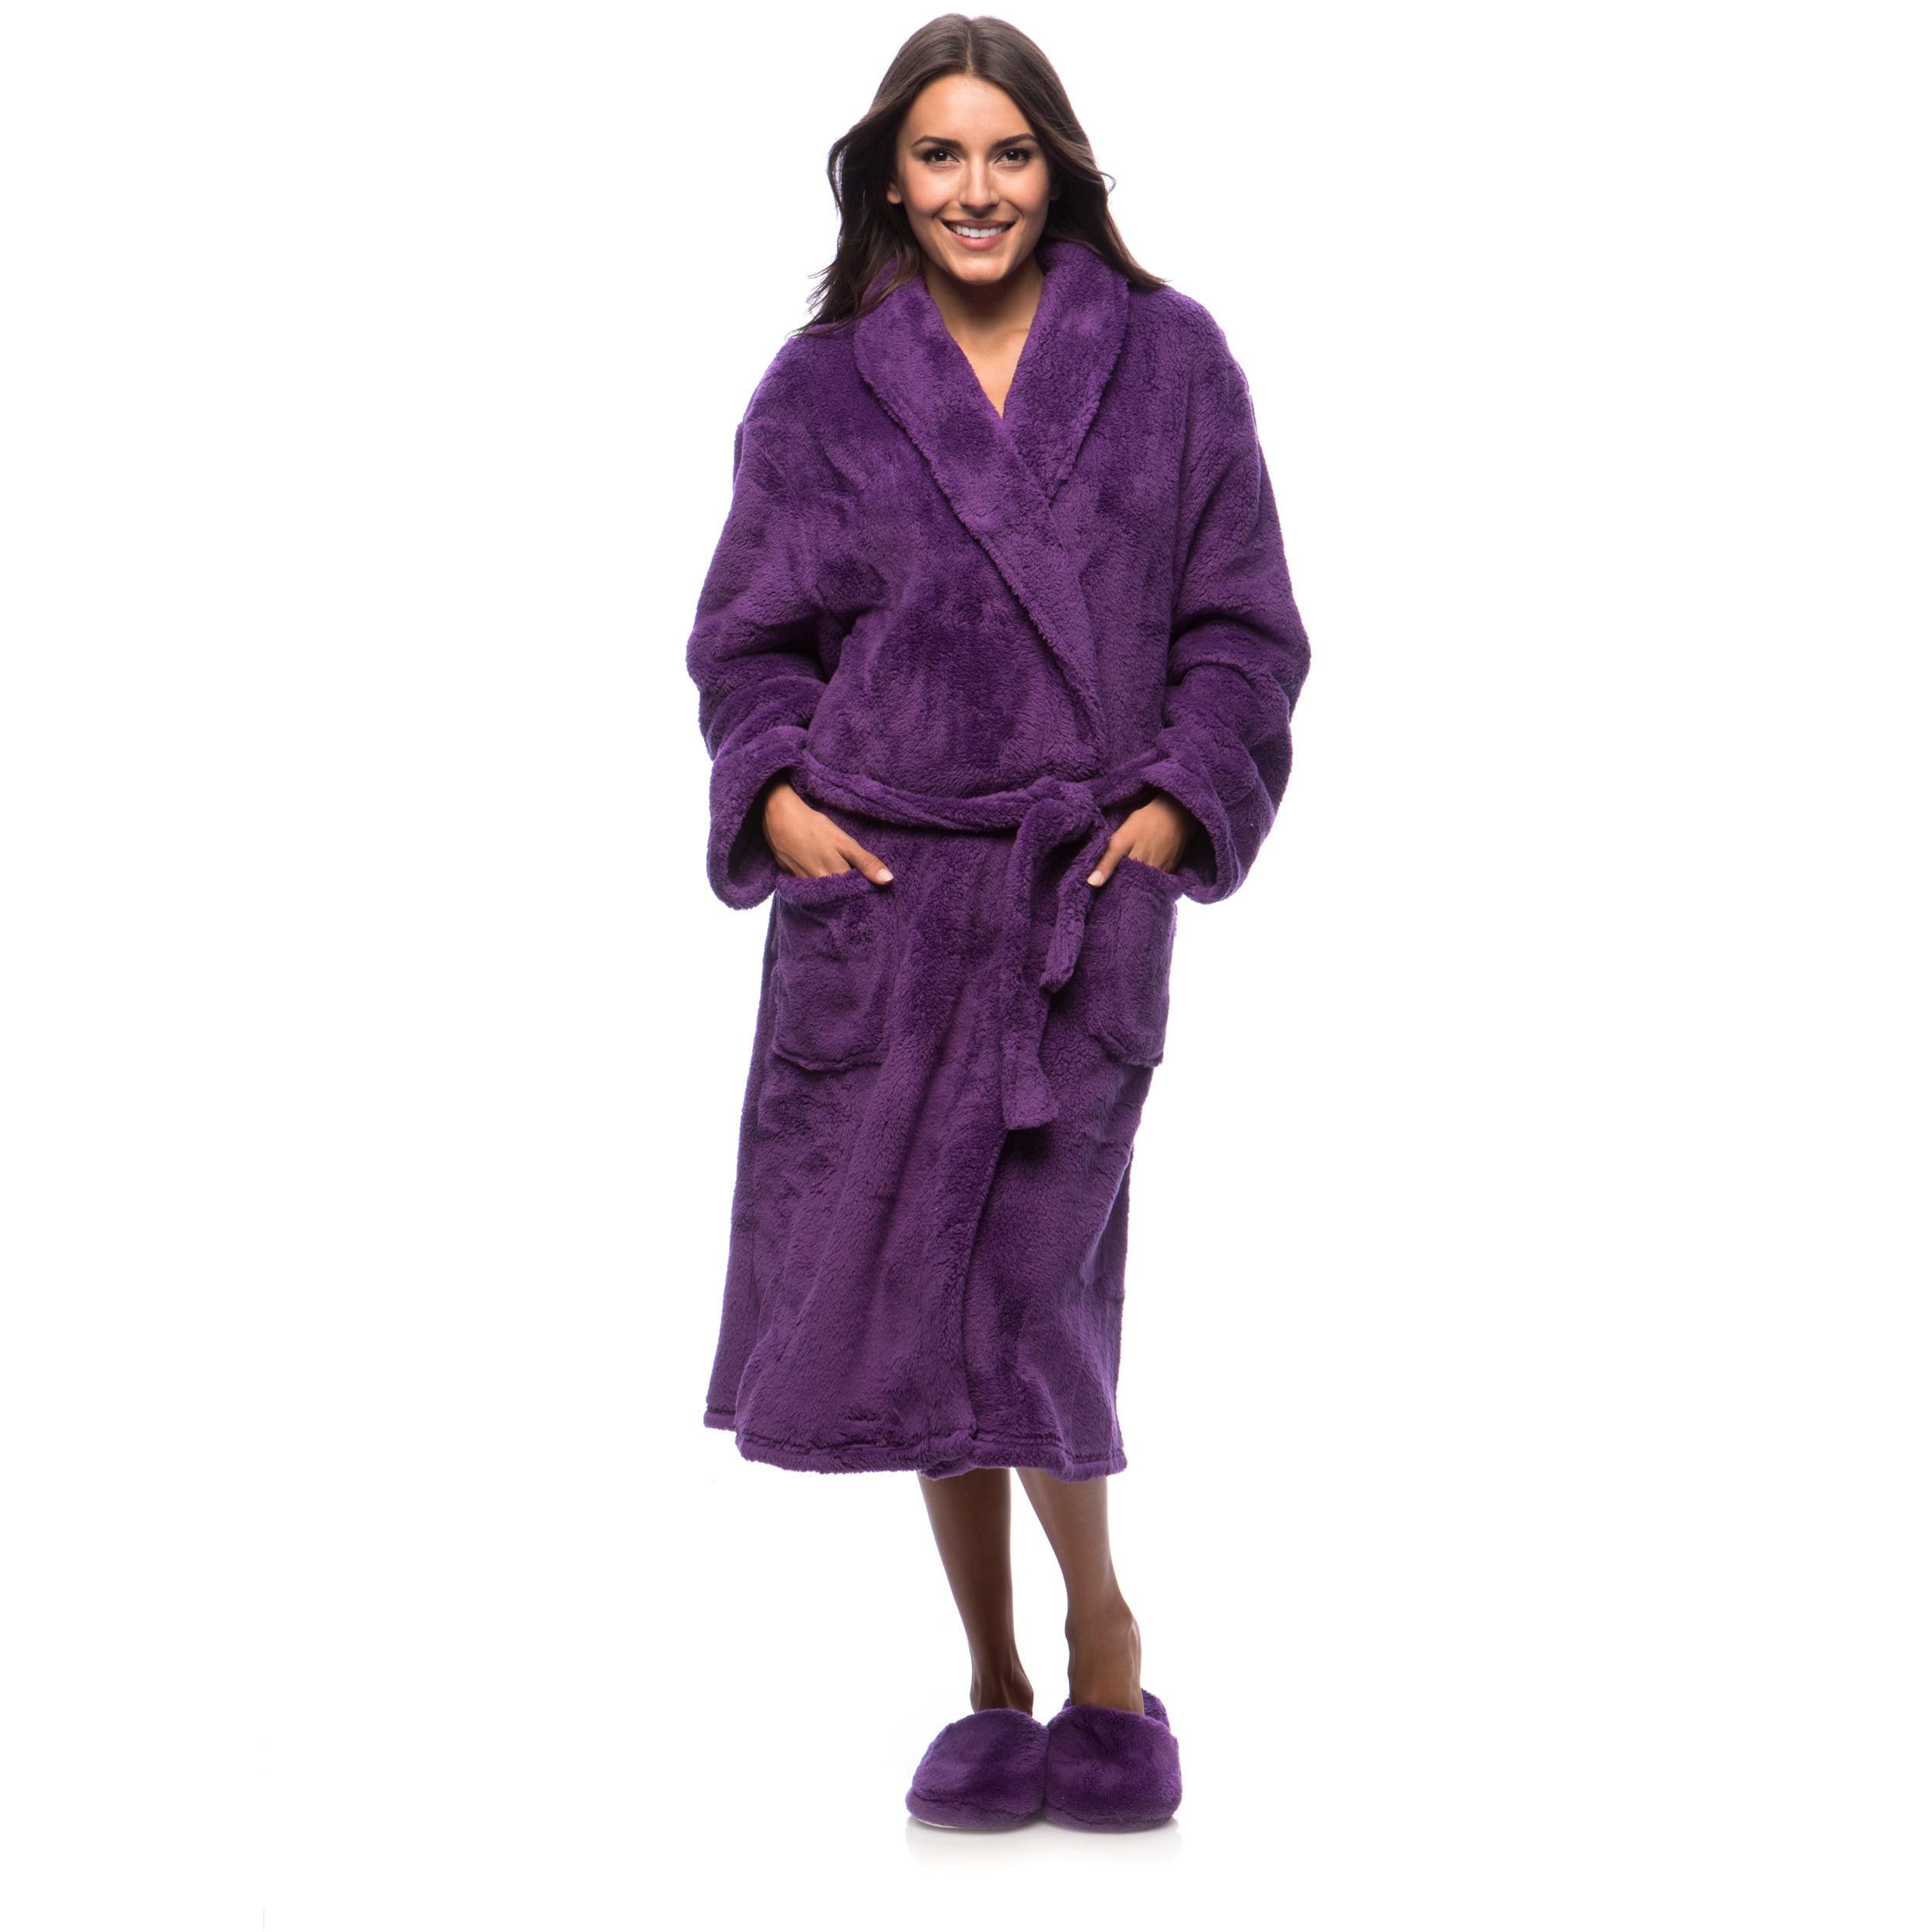 17f19ecd8b Cozy Fleece Ultrasoft Plush Bath Robe and Slipper Set - Walmart.com